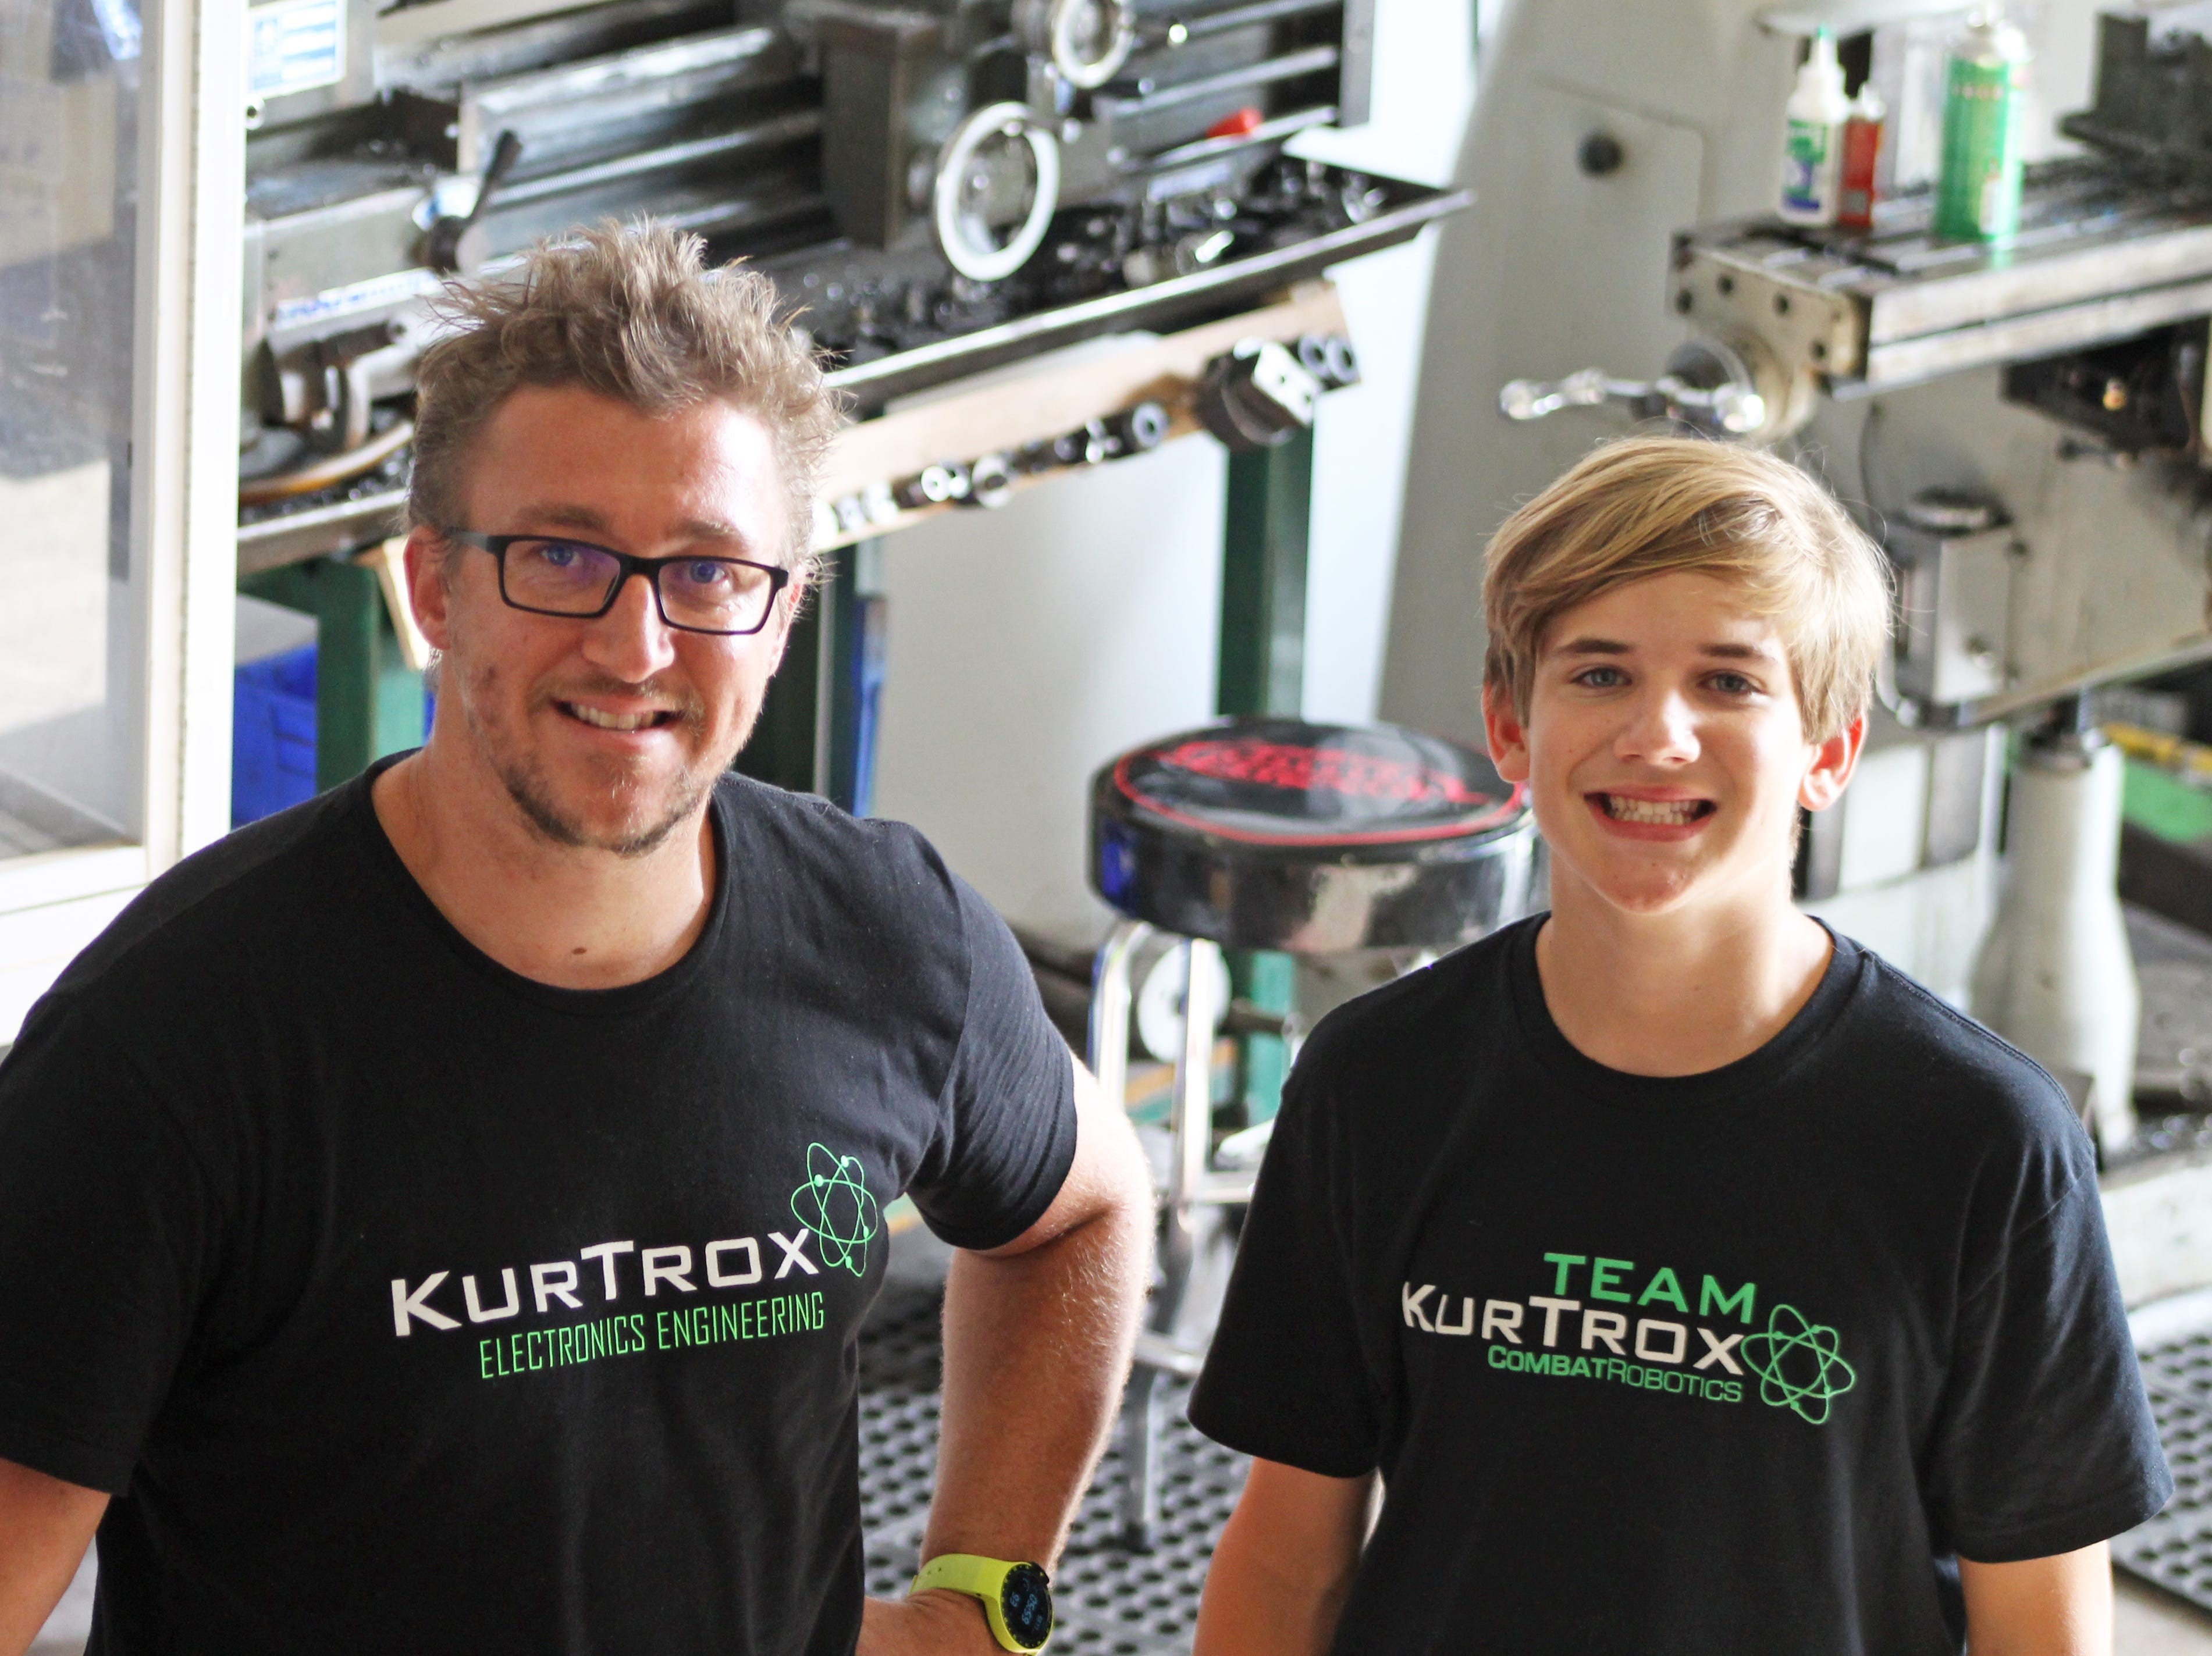 Kurt Durjan and Grant Pitcher at KurTrox Electronics Engineering and Treasure Coast Makerspace.